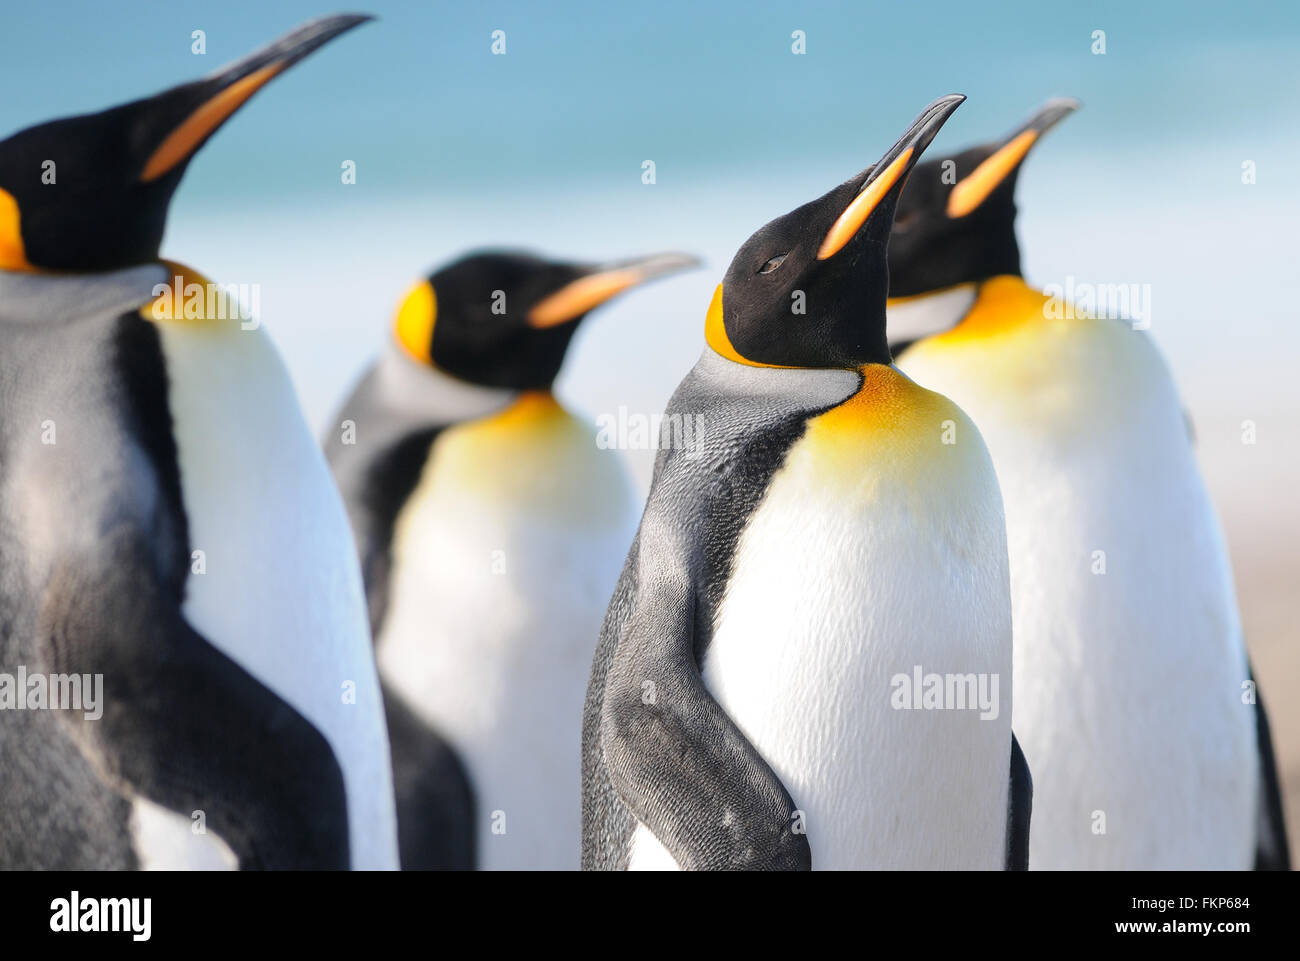 King penguins (Aptenodytes patagonicus).  Saunders Island, Falkland Islands - Stock Image